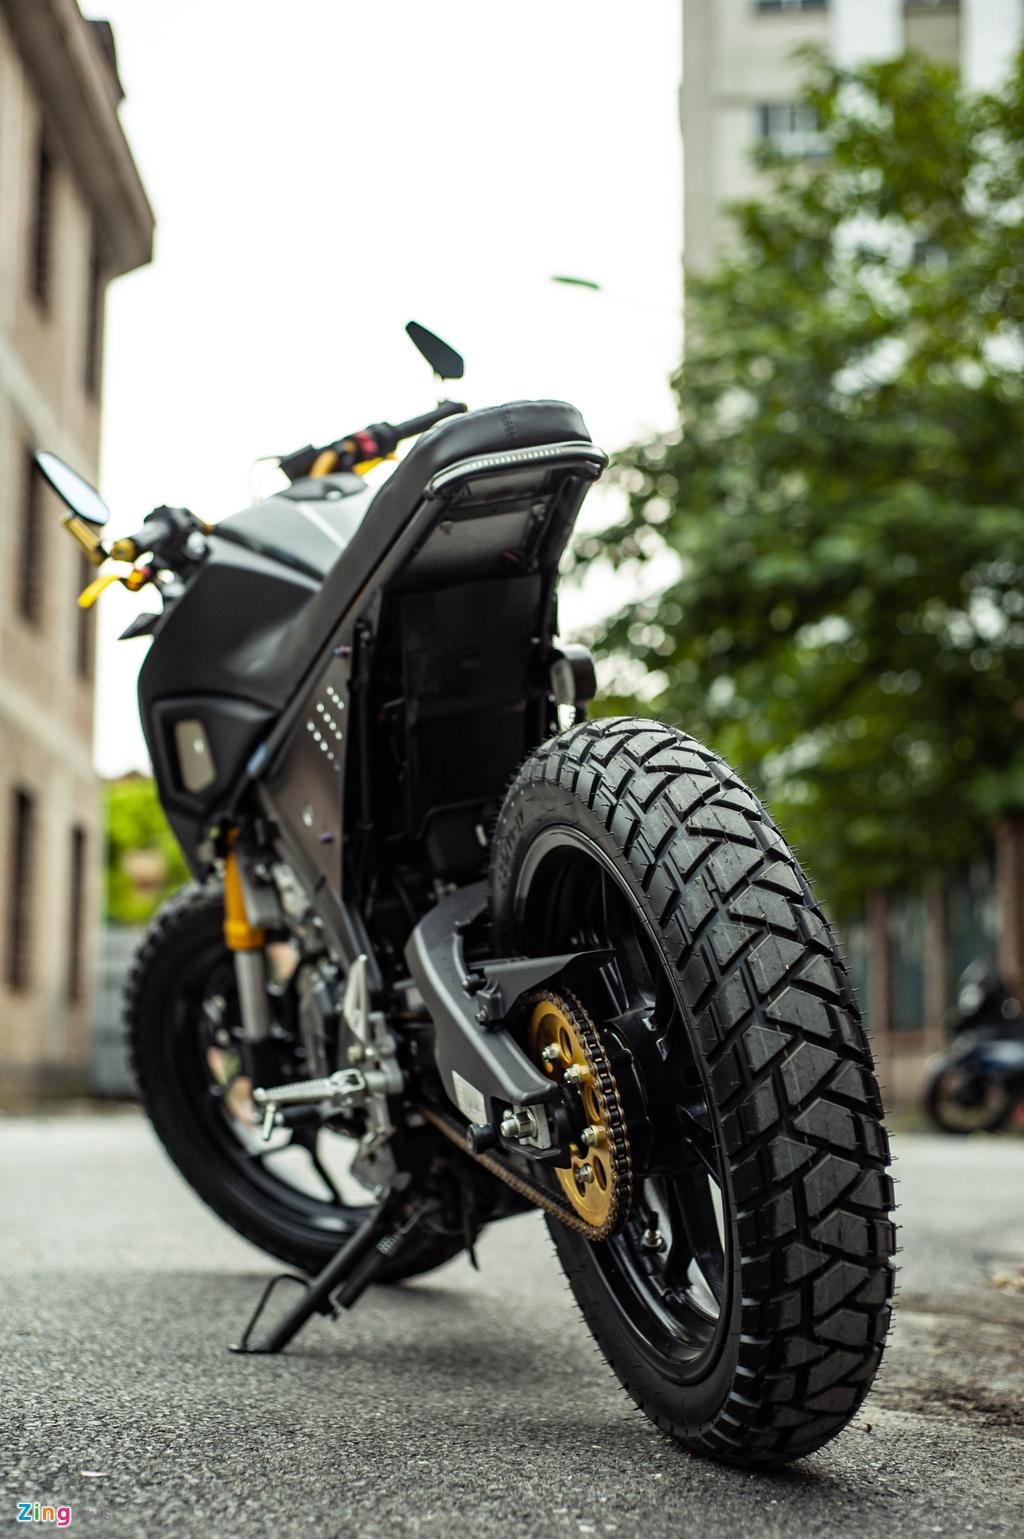 Yamaha TFX 150 lot xac hoan toan theo phong cach cafe racer tai Ha Noi hinh anh 8 TFX_do_zing_47_.jpg